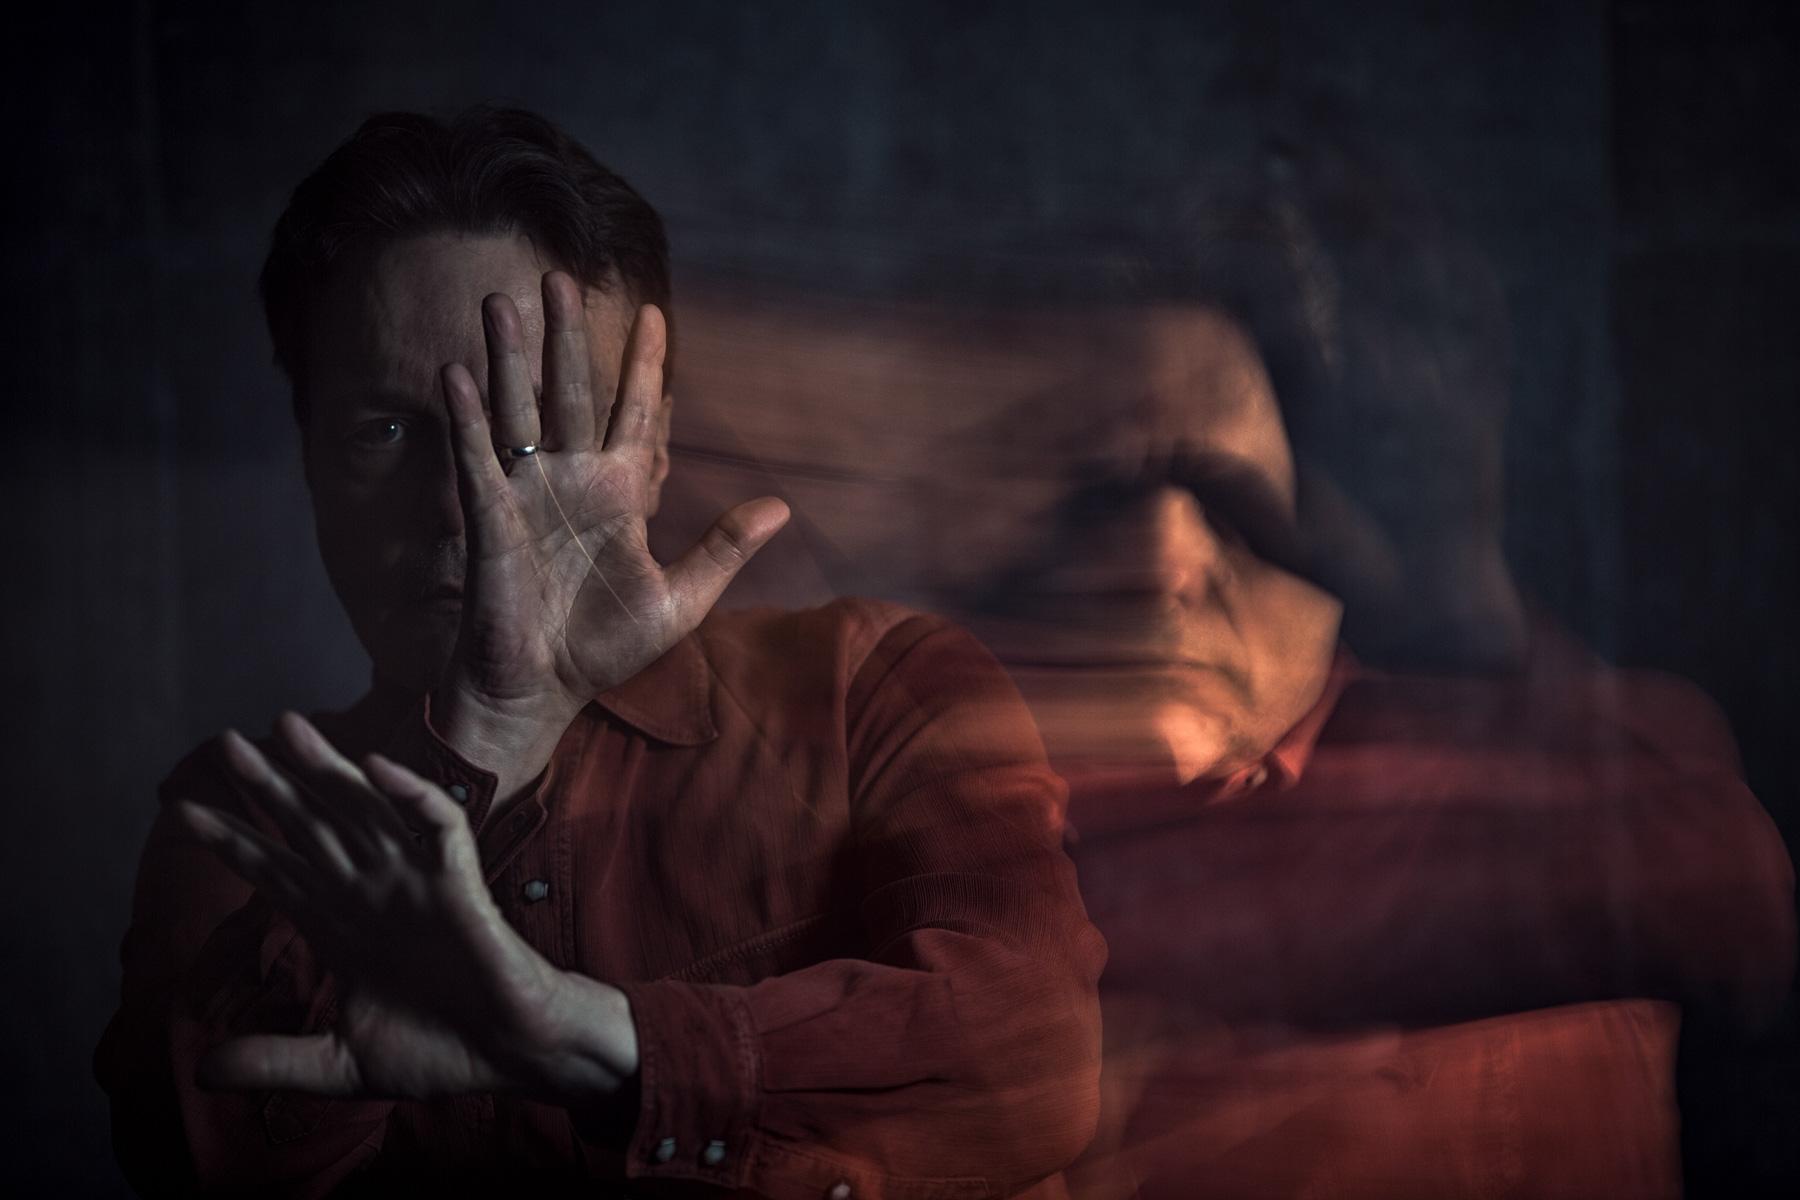 hiding-portrait-mystery